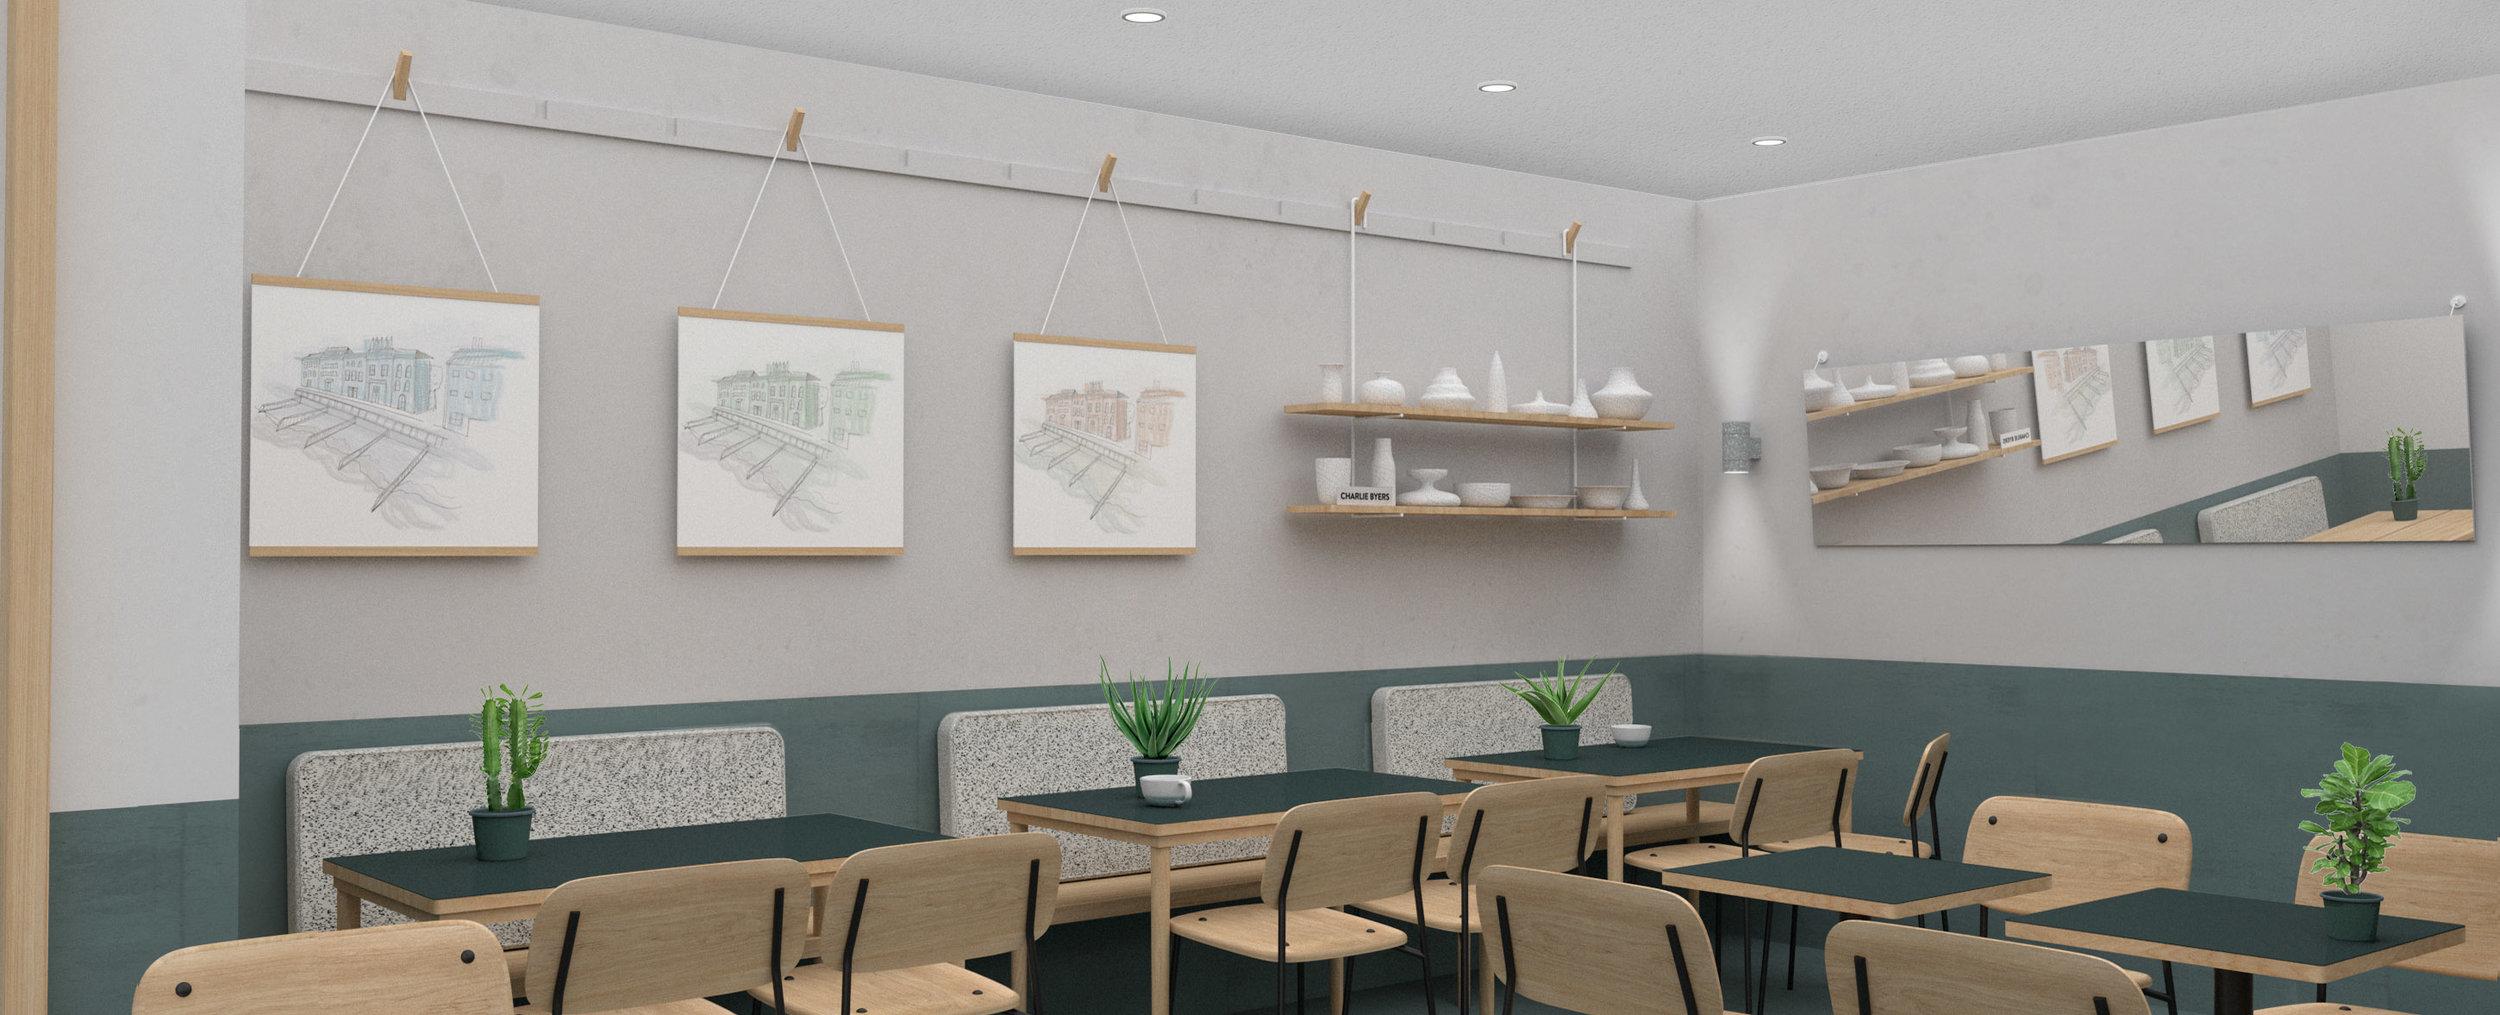 lunarlunar_interior_design_cafe_craft_coffee_banquette_hastings_view b.jpg